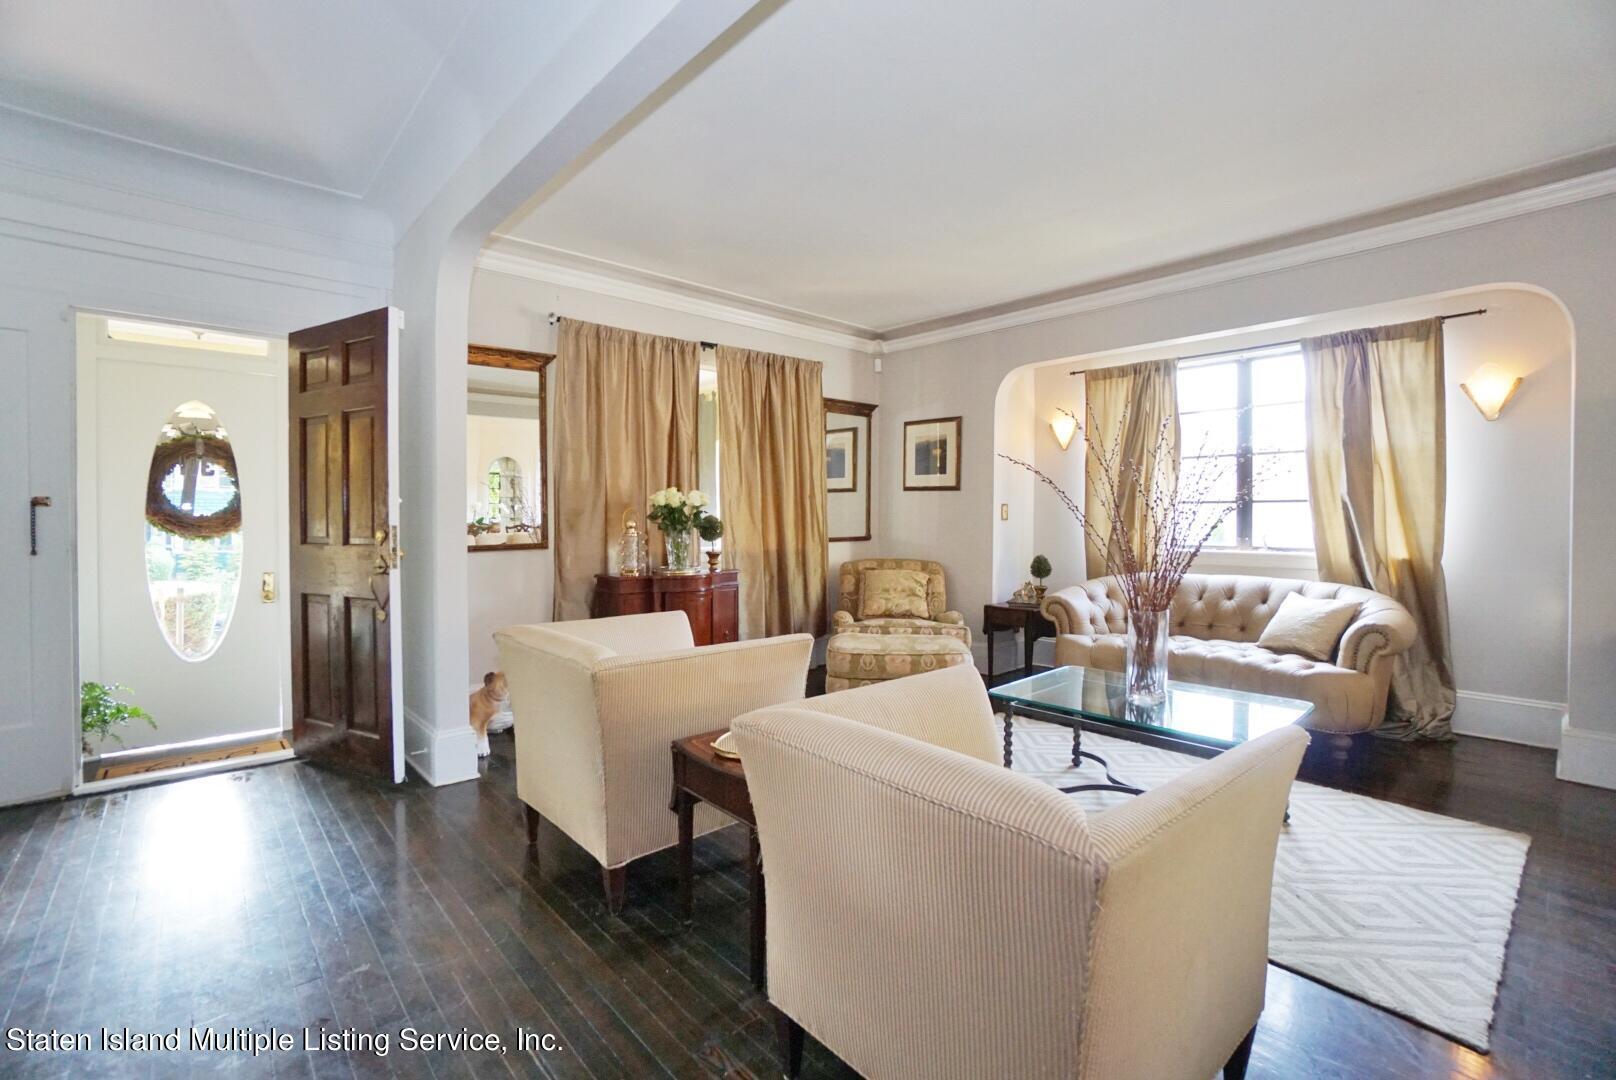 Single Family - Detached 311 Bement Avenue  Staten Island, NY 10310, MLS-1147133-6